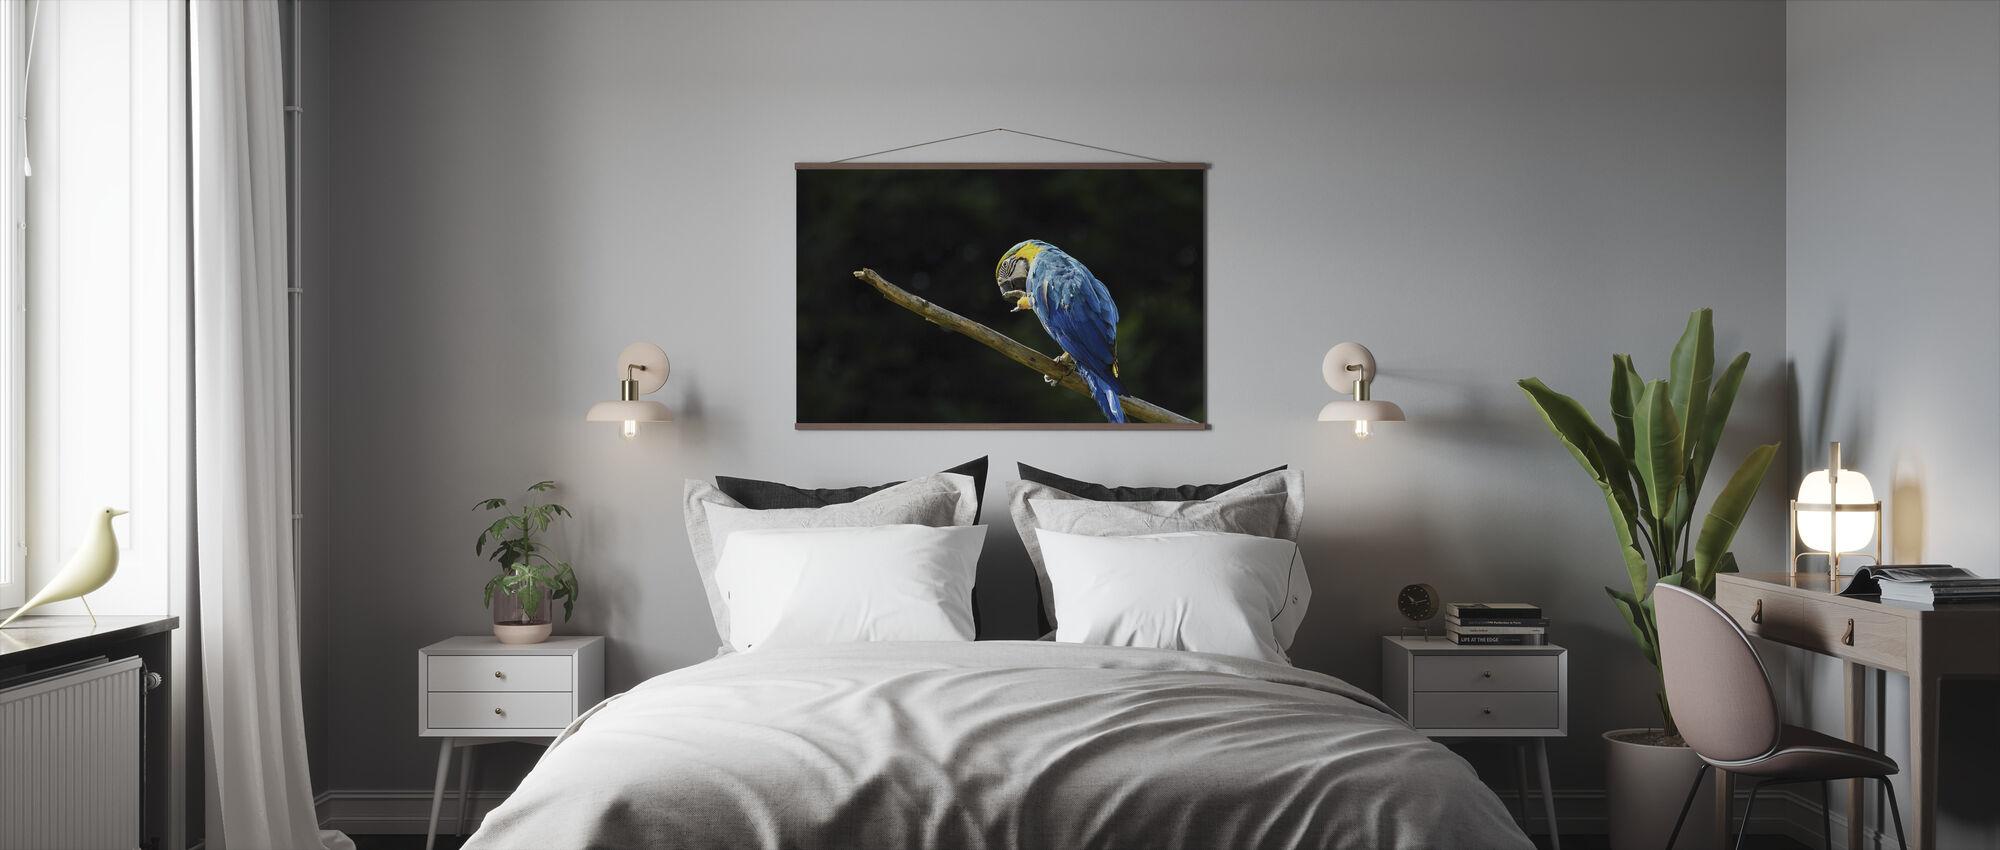 Papagei - Poster - Schlafzimmer